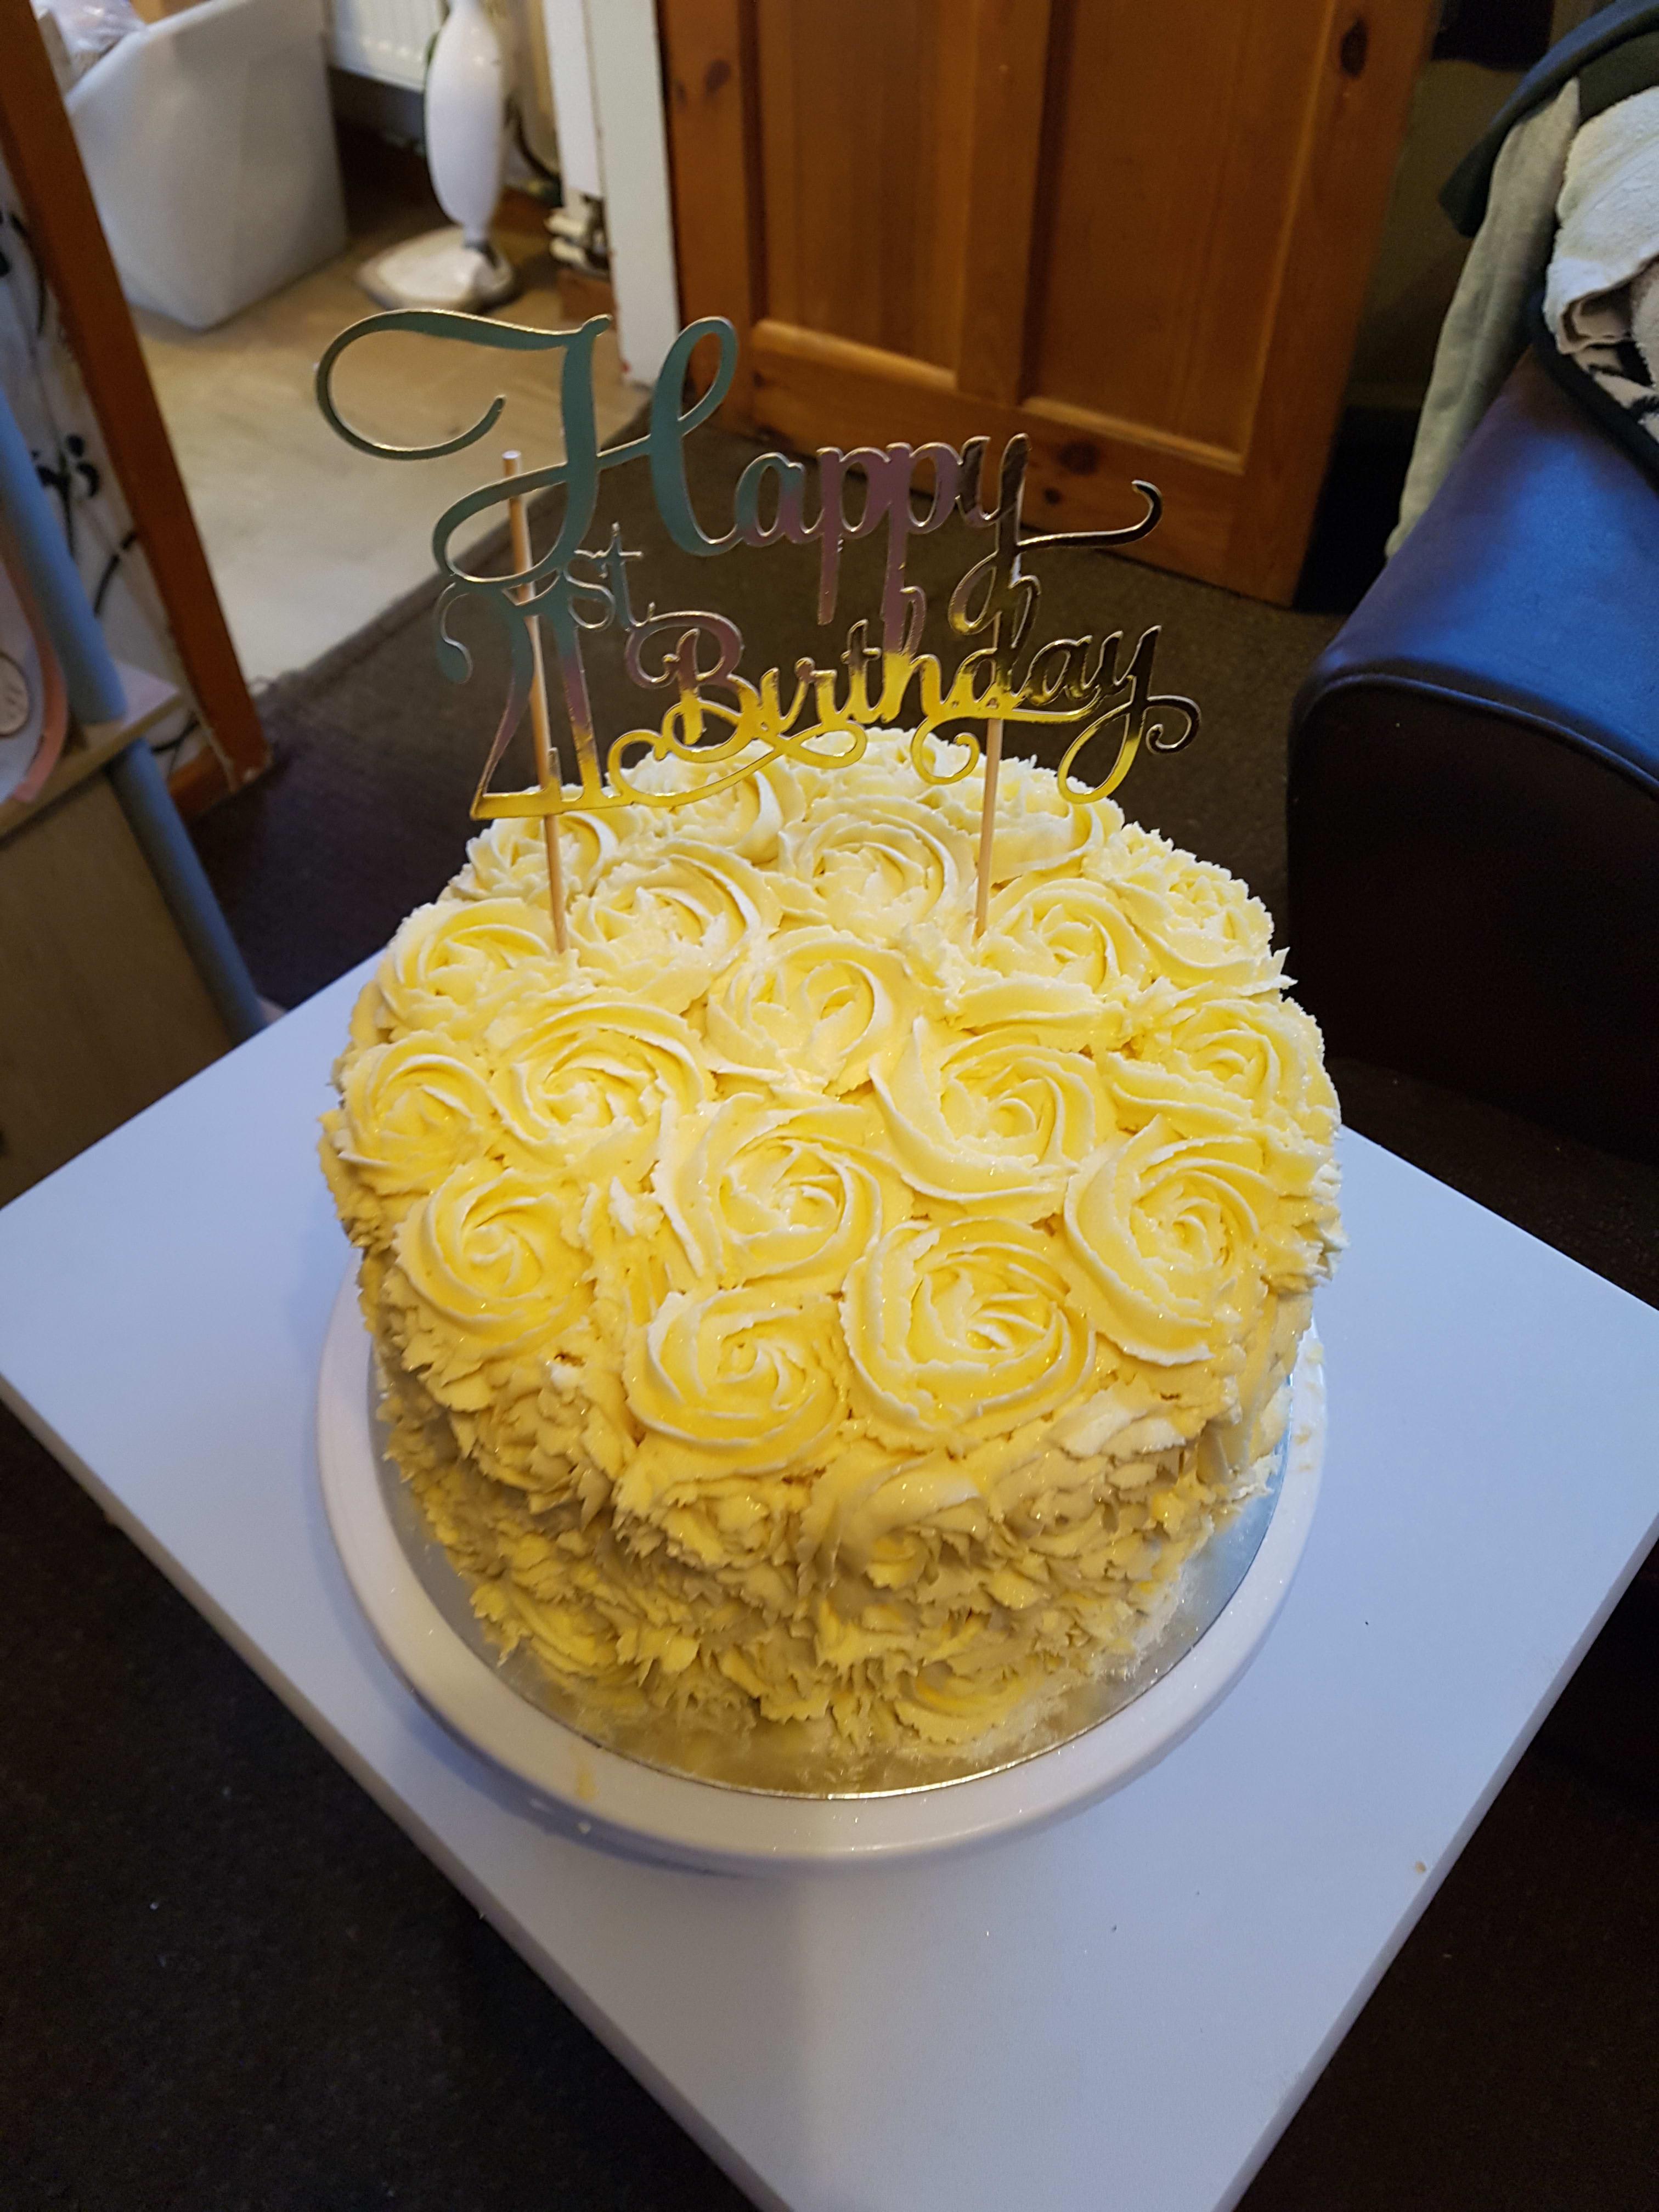 Dachell's Cakes